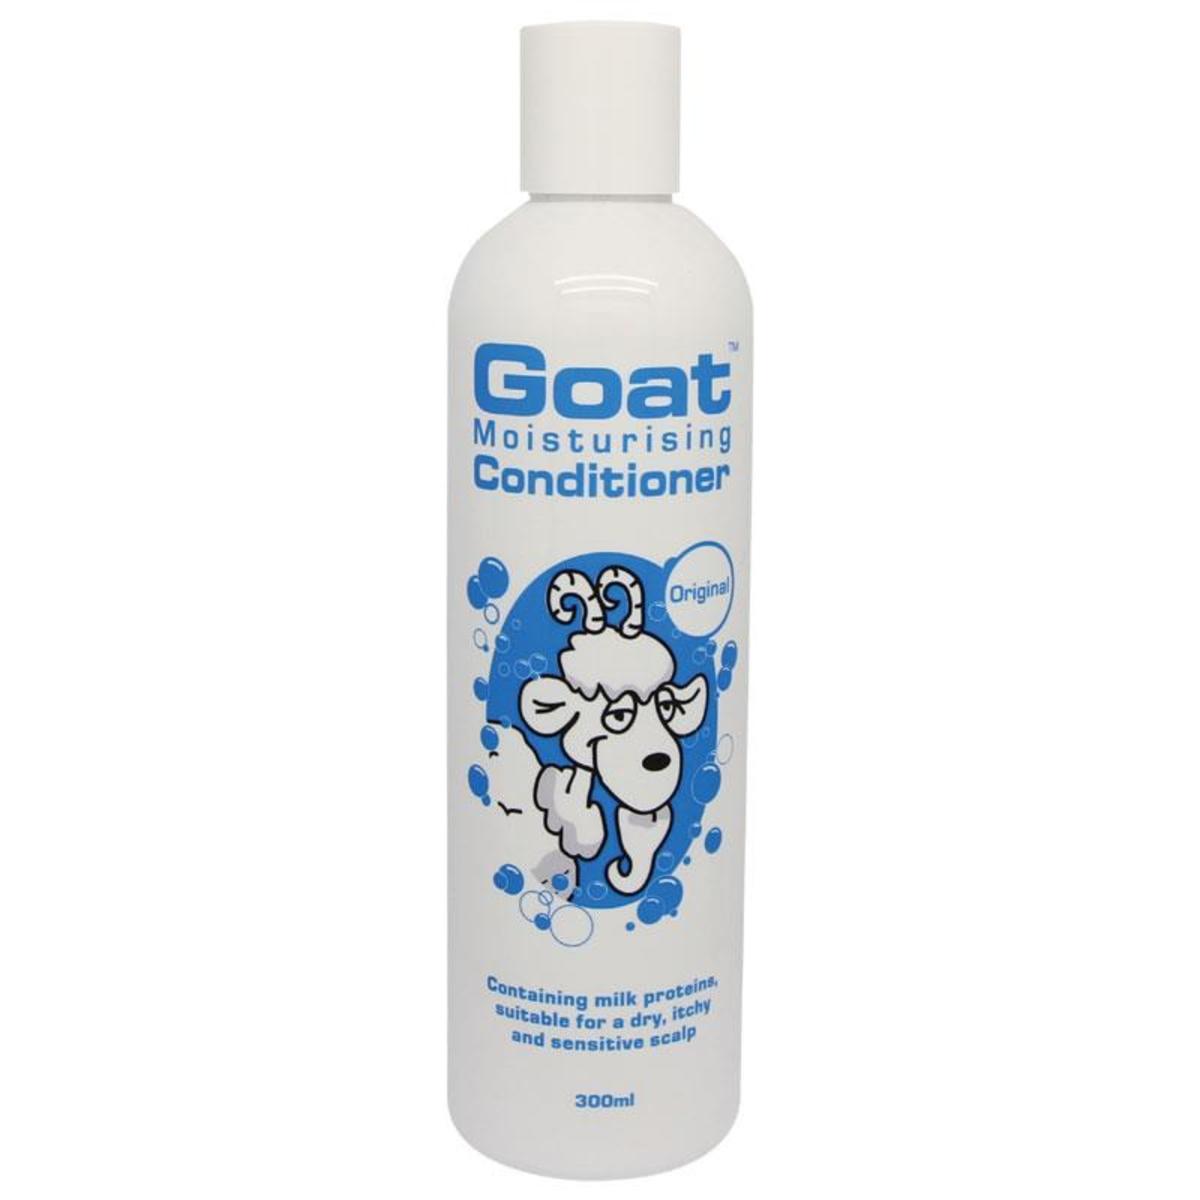 Goat conditioner with original 300ml (Parallel Import)